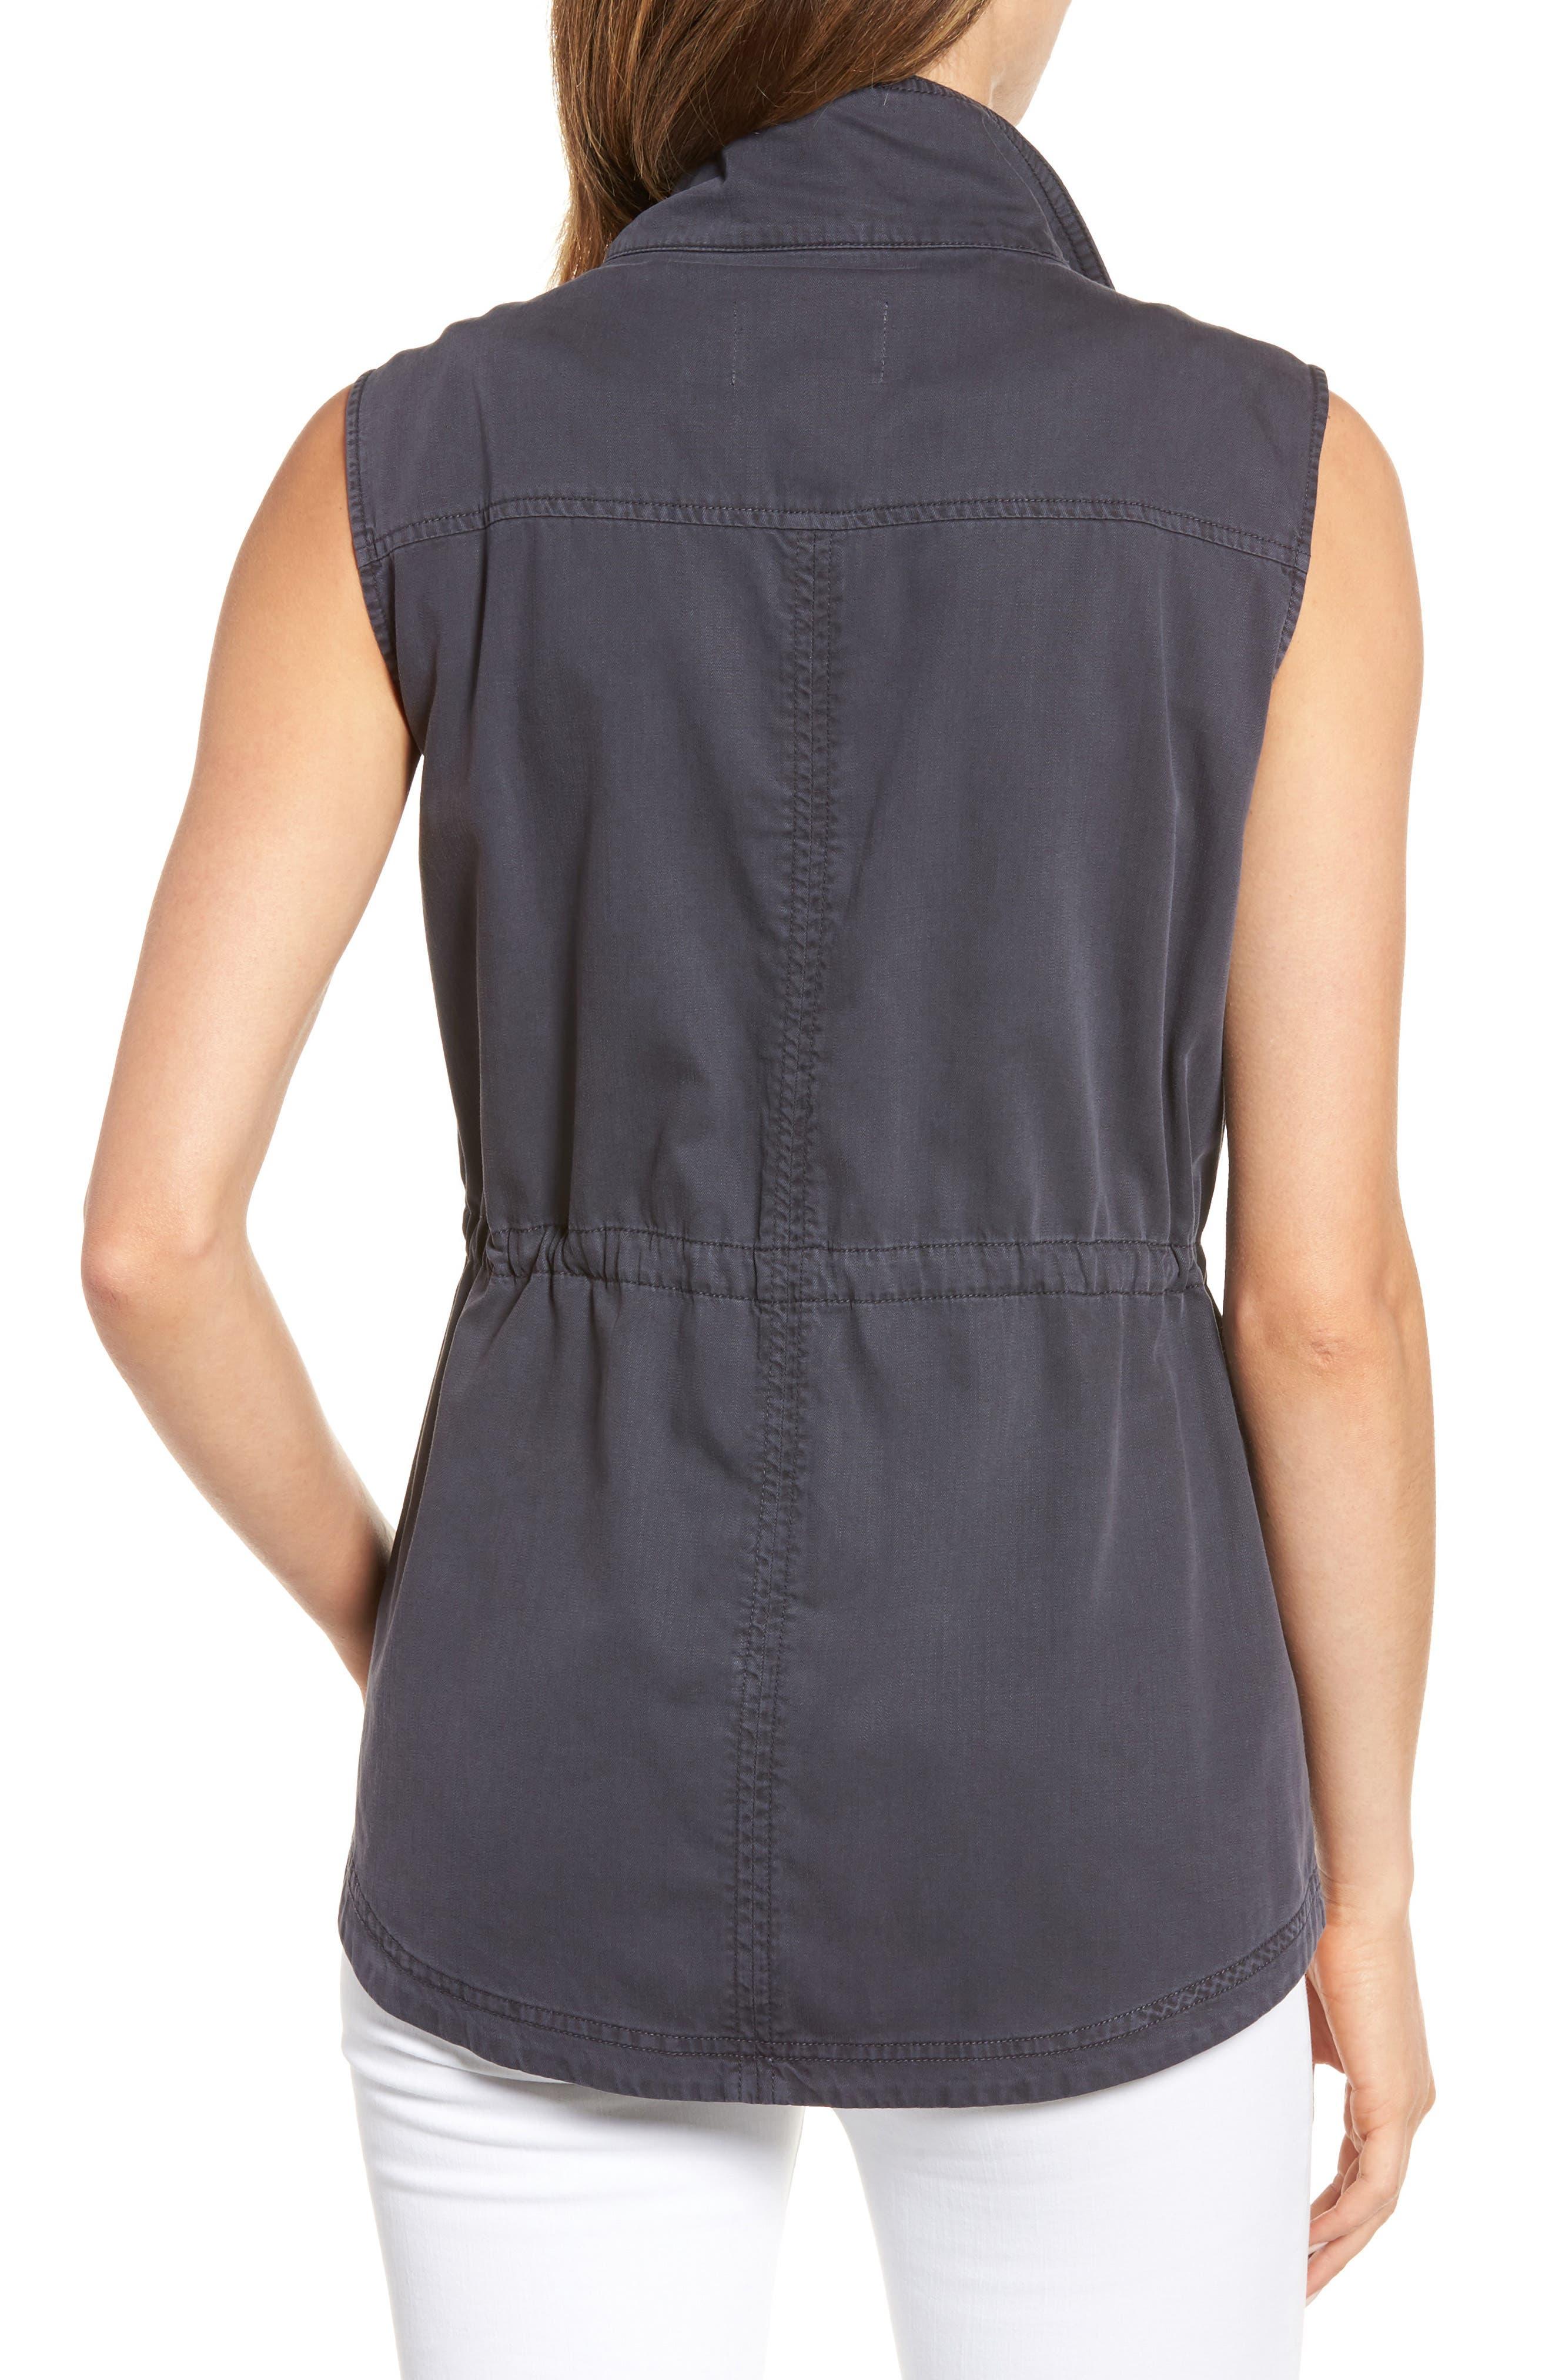 Utility Vest,                             Alternate thumbnail 2, color,                             Grey Ebony